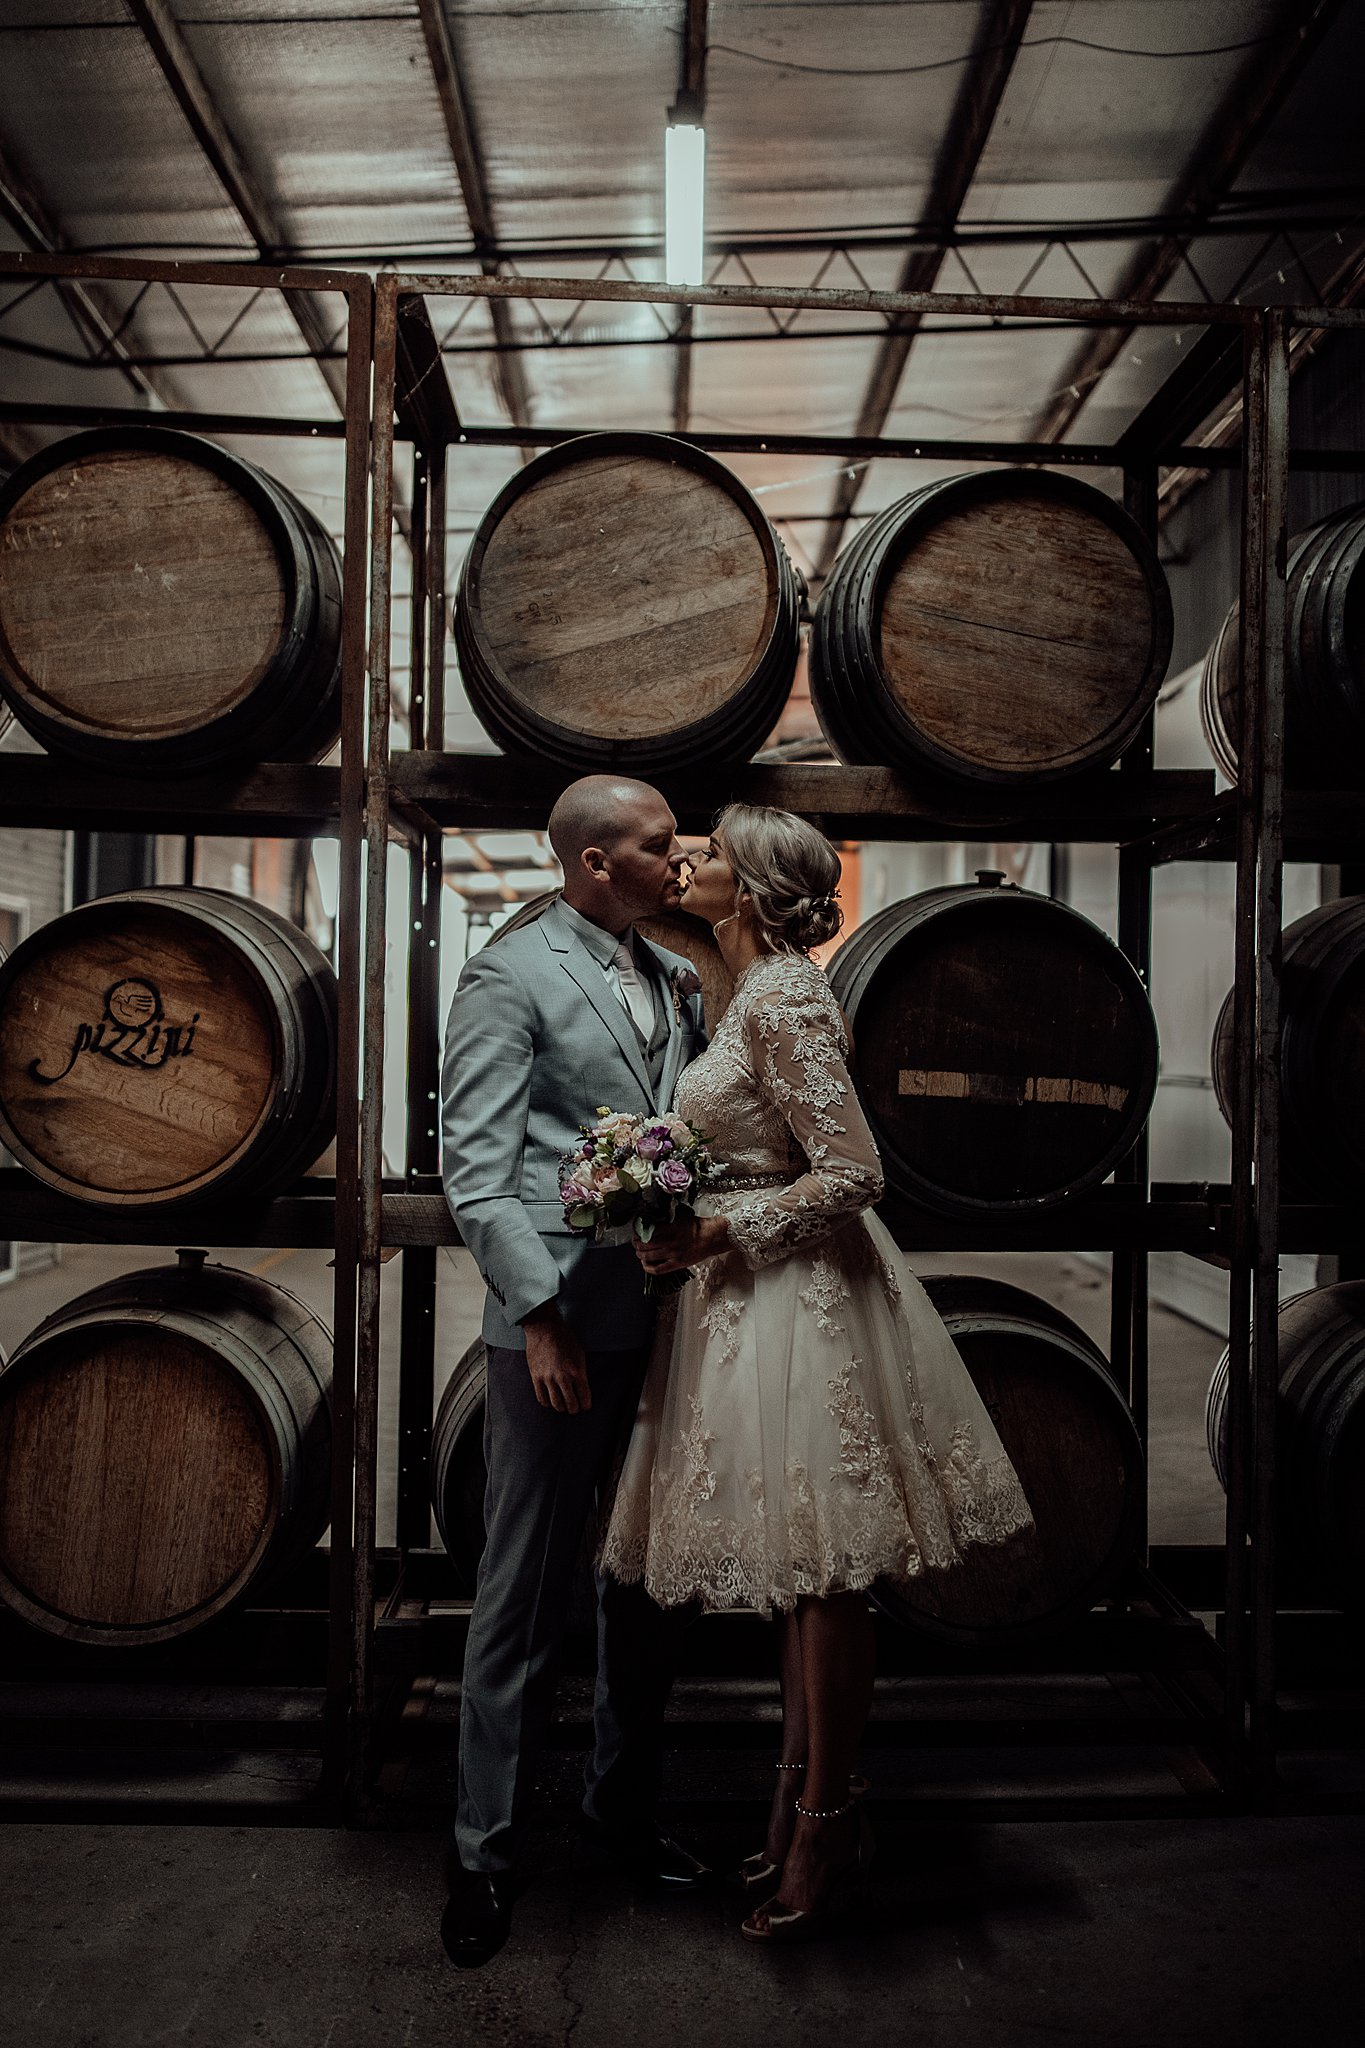 mickalathomas_puremacphotography_weddingphotographer_couplephotographer_Sheppartonphotographer_3413.jpg